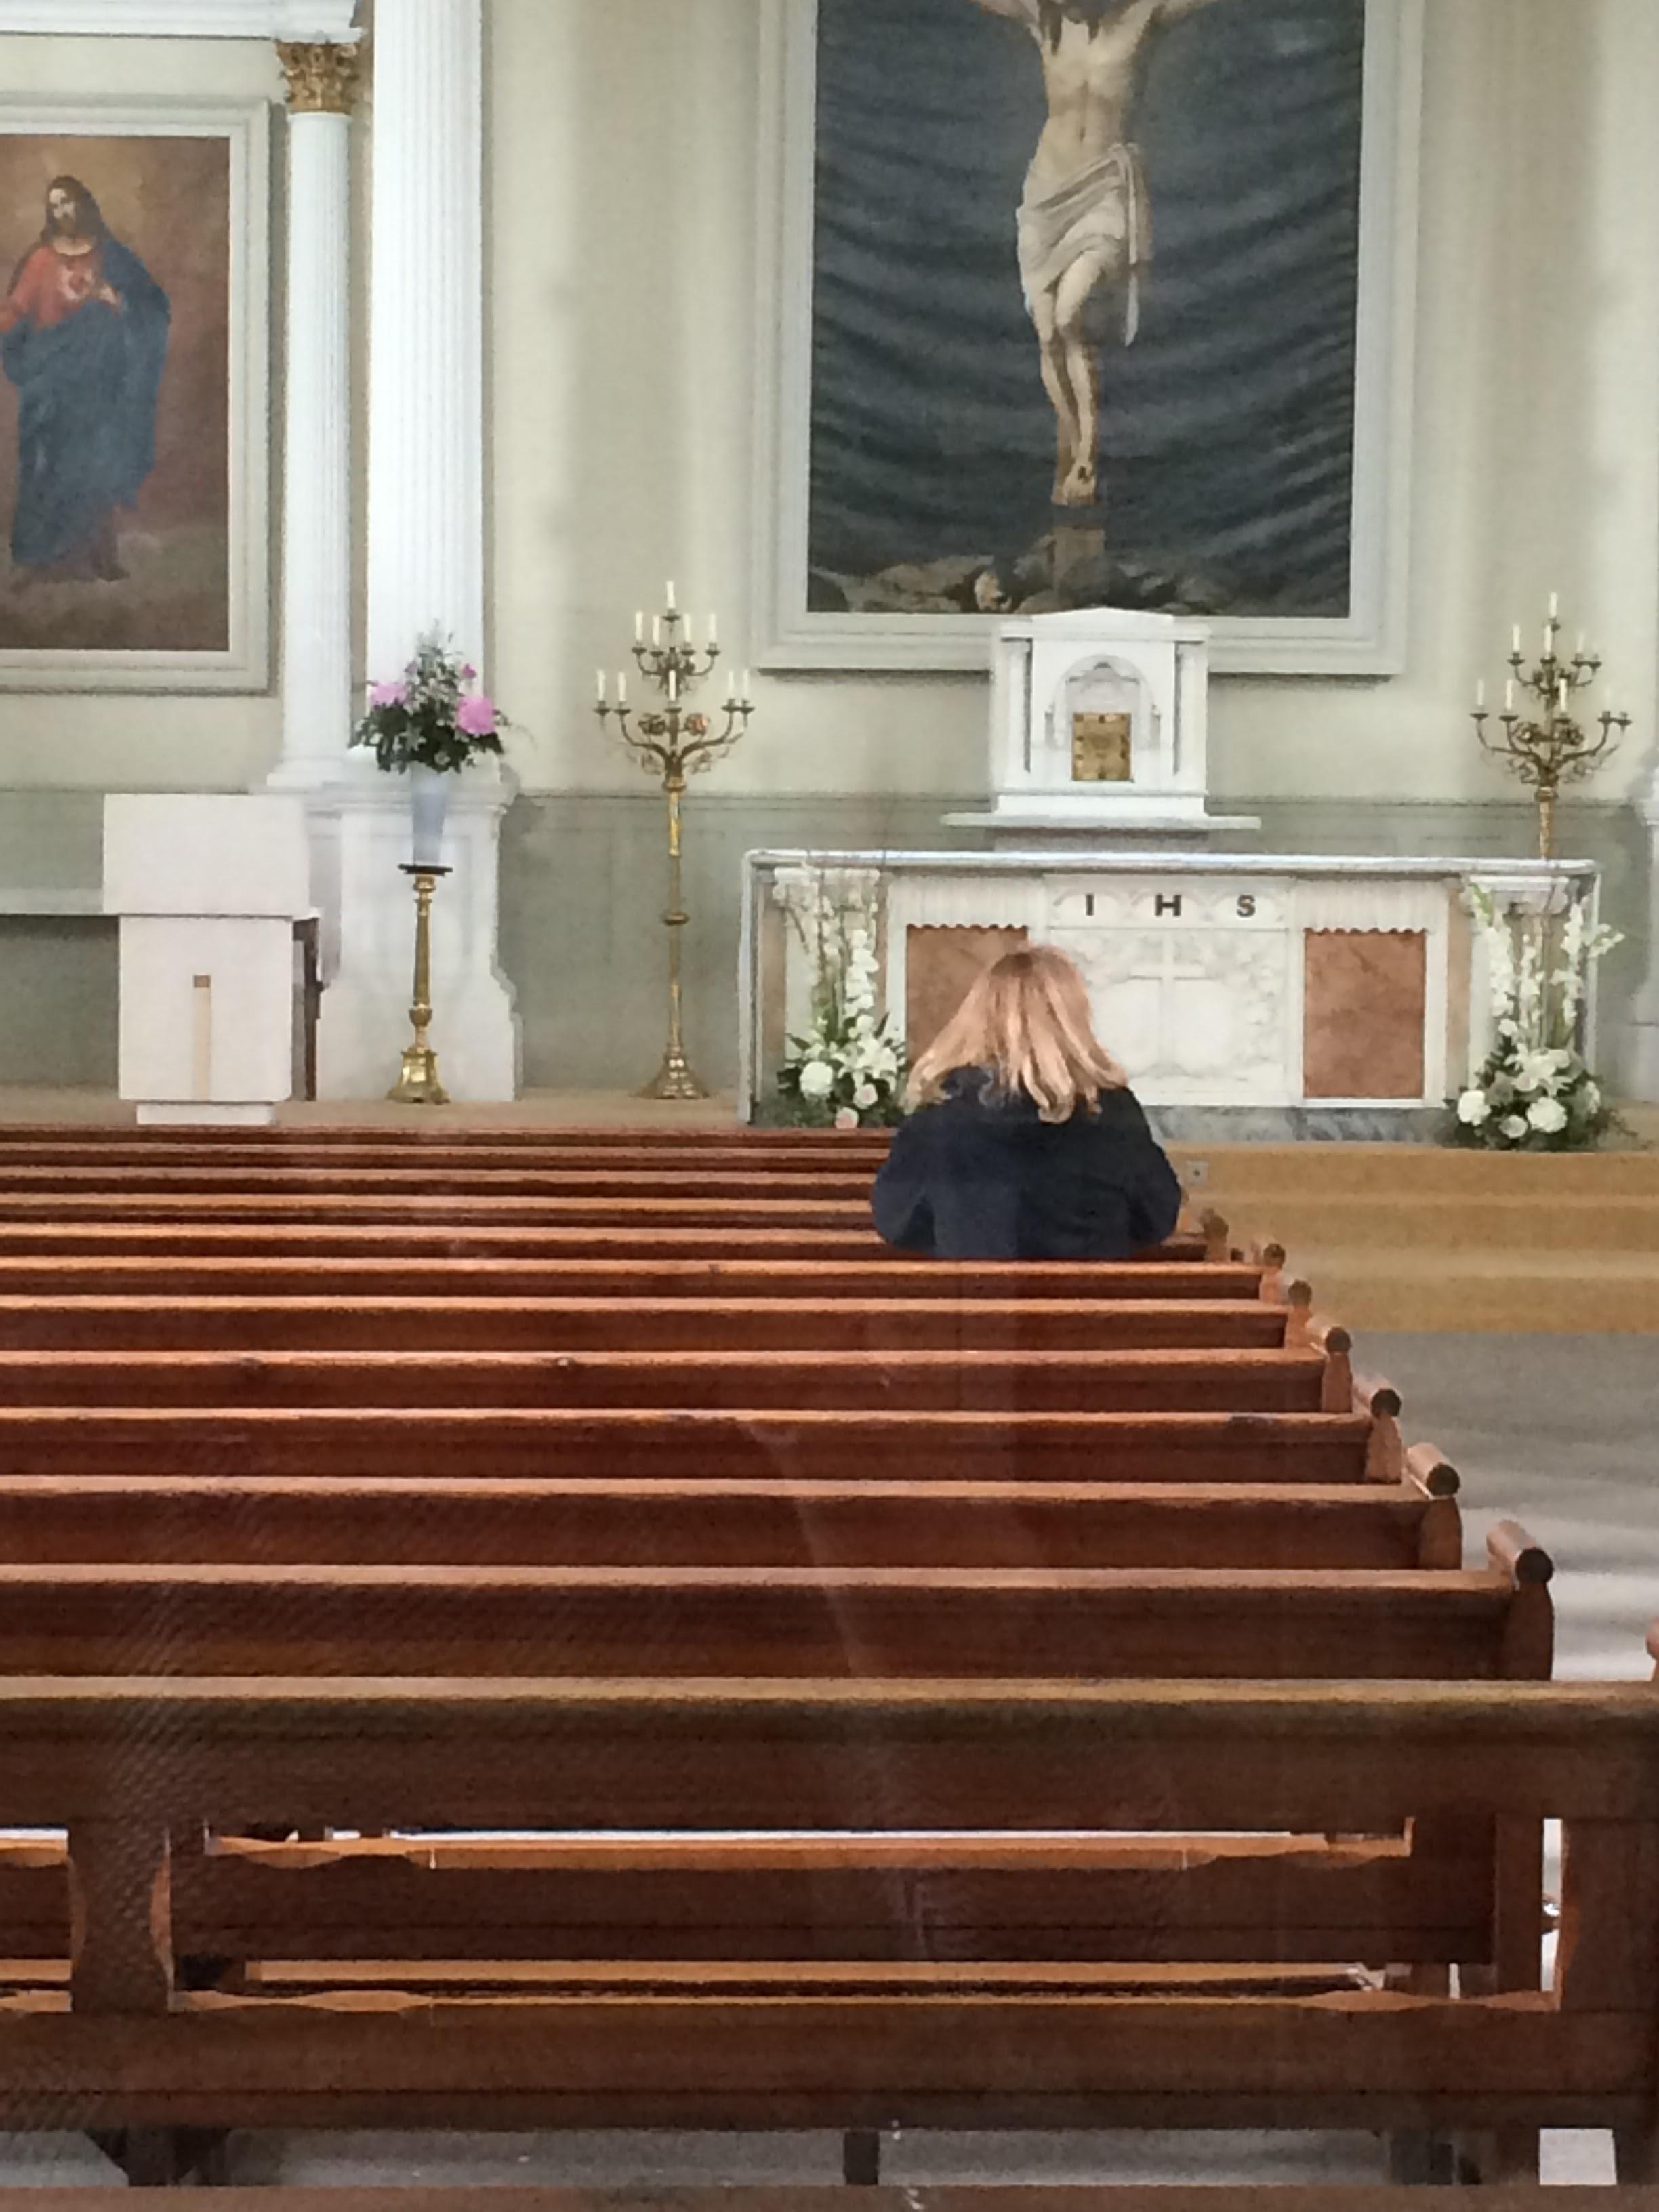 Mammy in the church